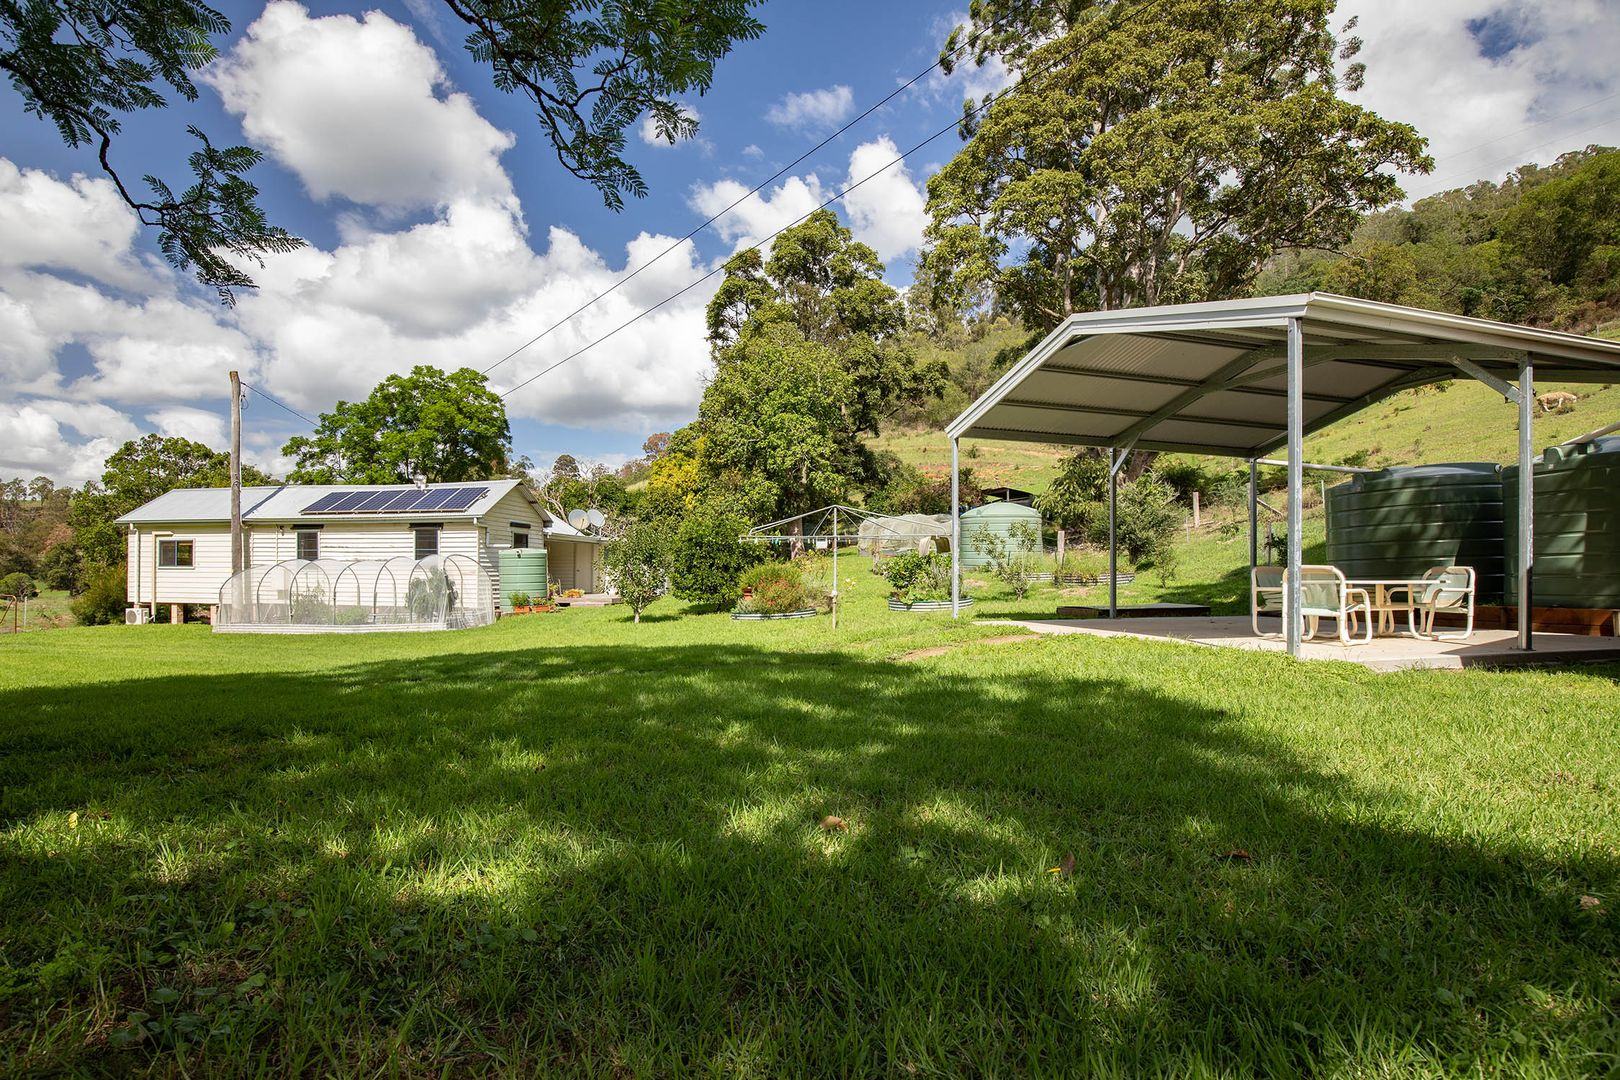 139 Testorellis, Copeland NSW 2422, Image 2